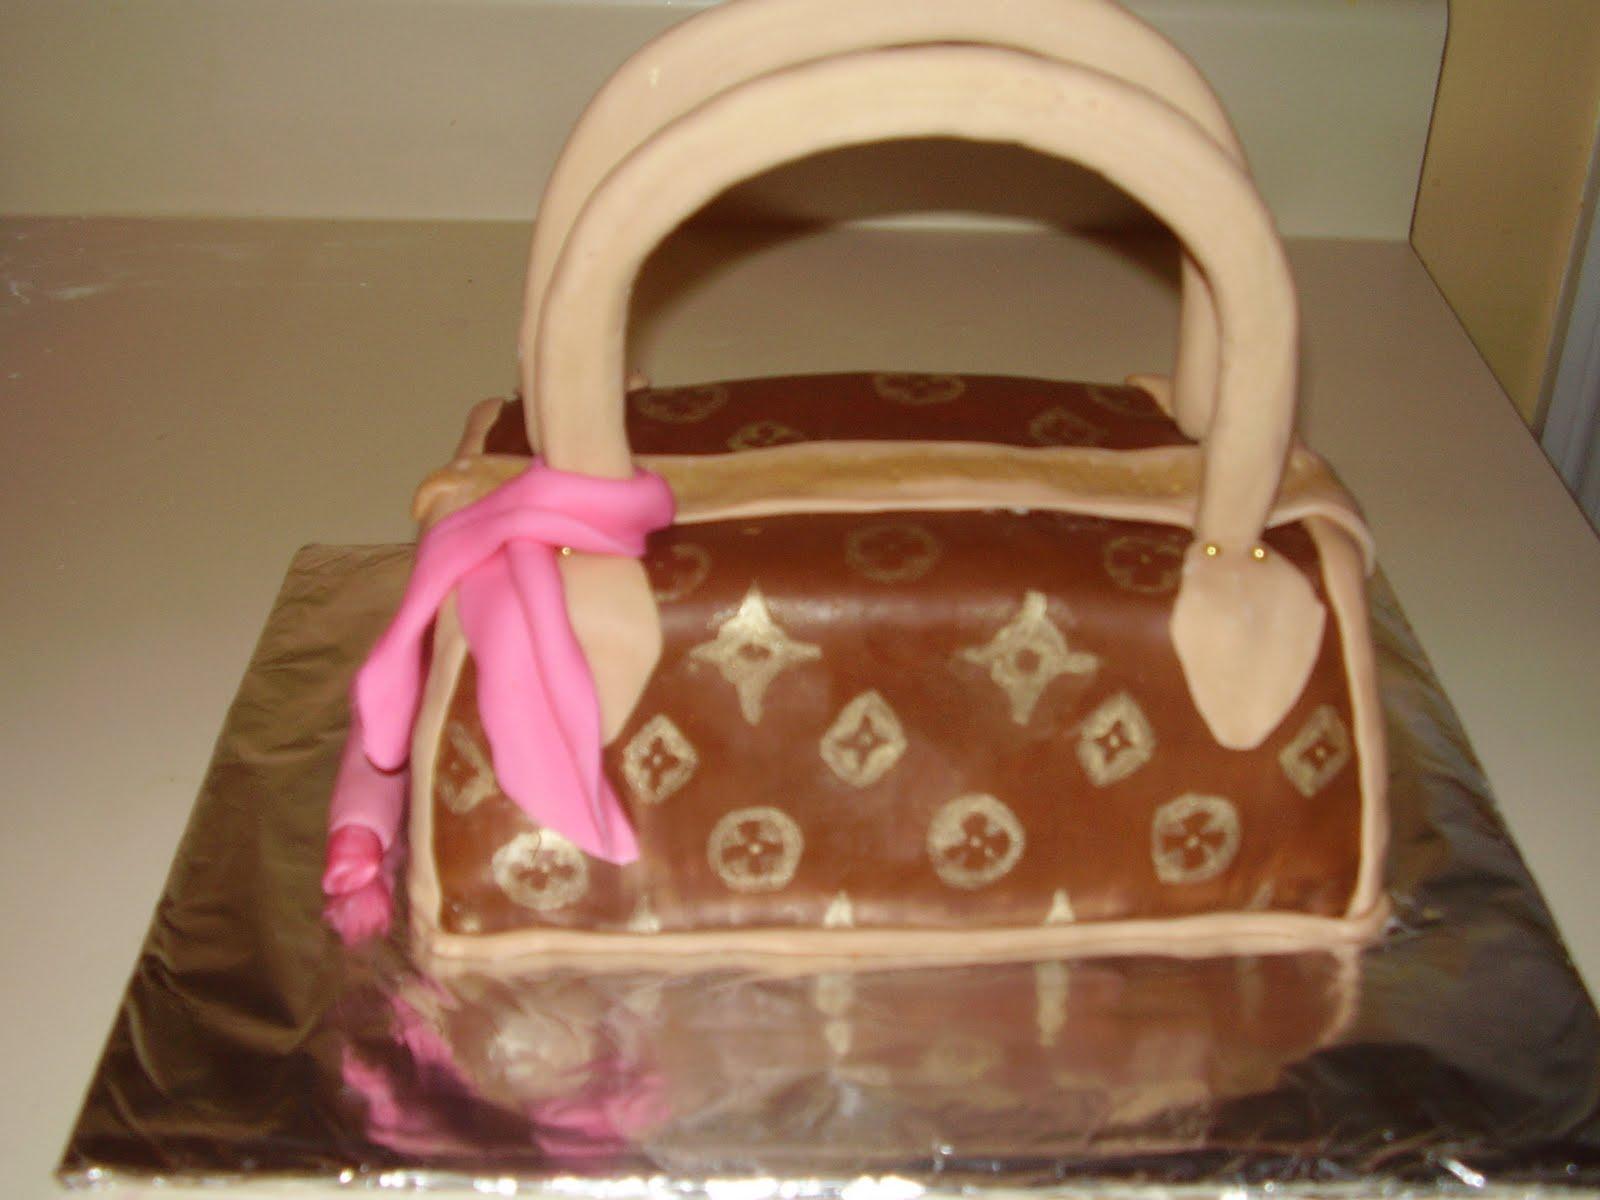 Zebra Cake Recipe Joy Of Baking: The Confectionista's Kitchen: May 2010